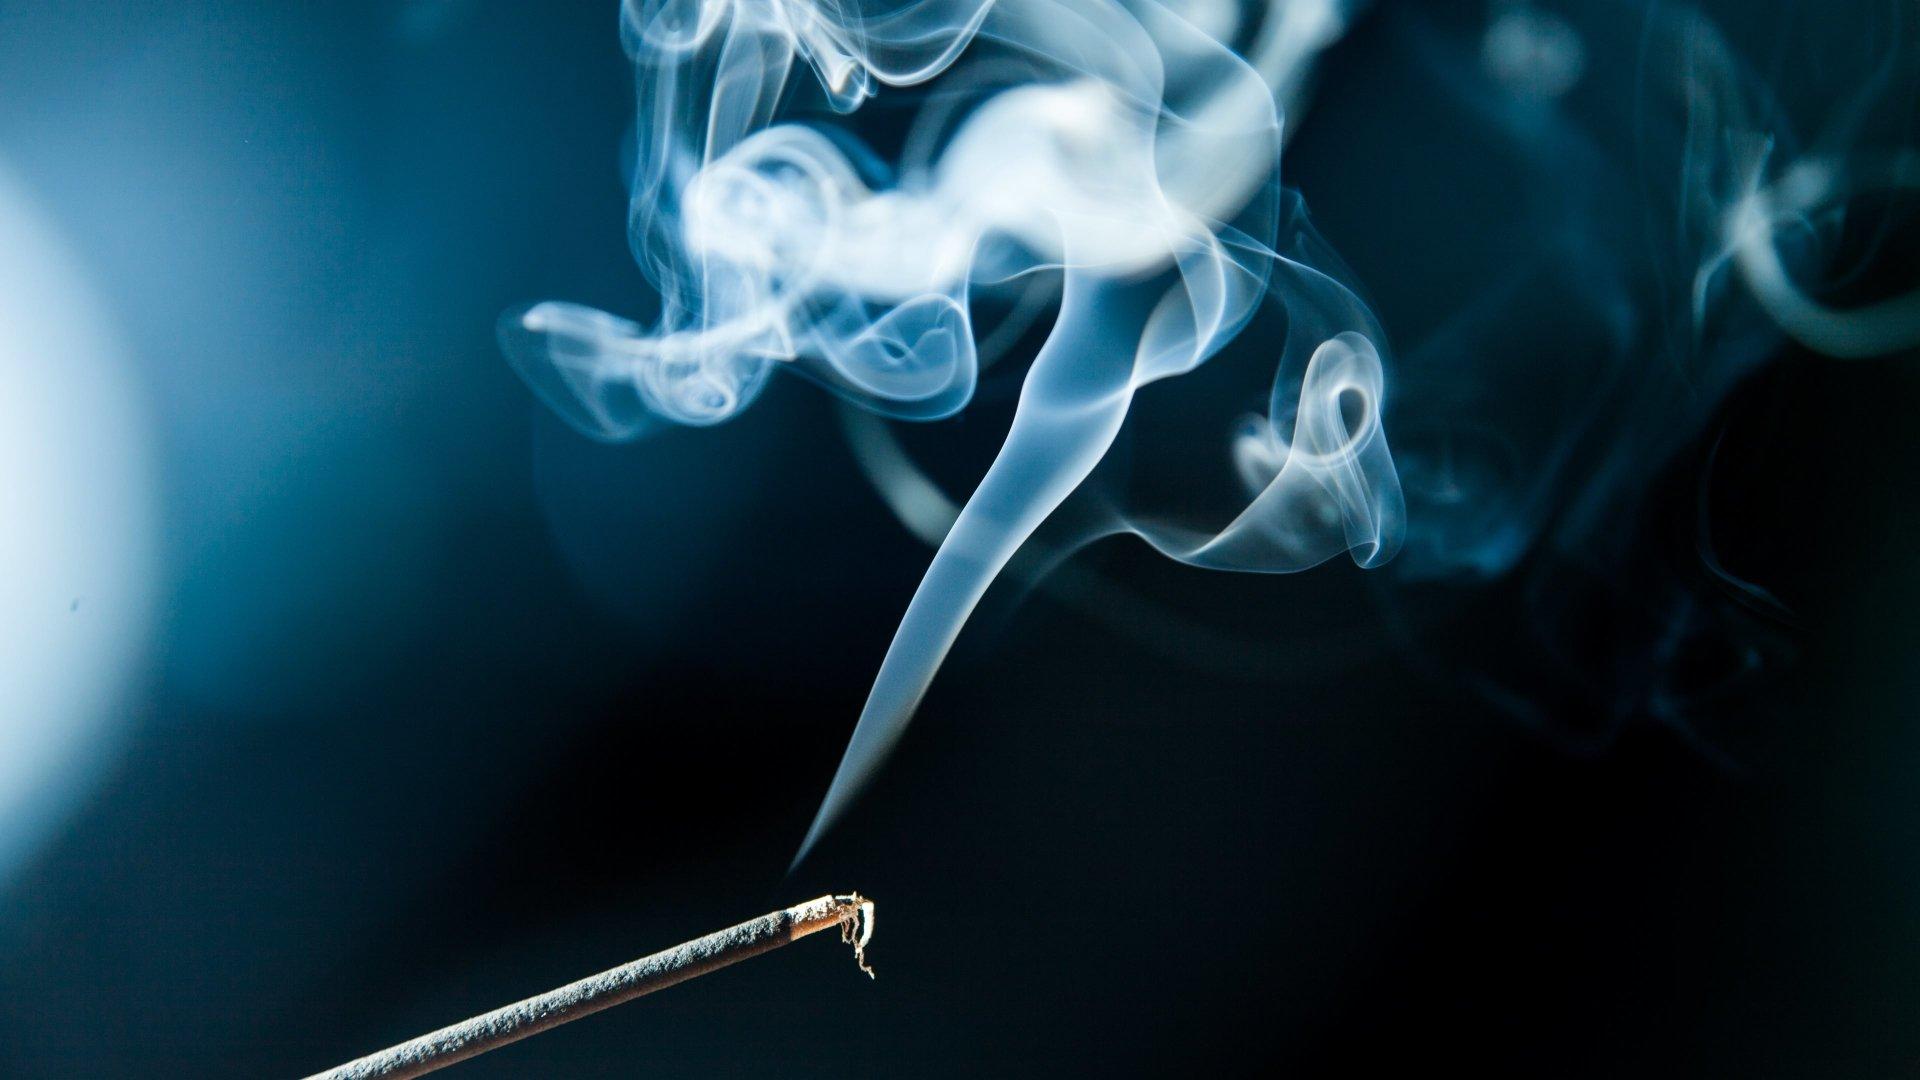 Photography - Smoke  Wallpaper